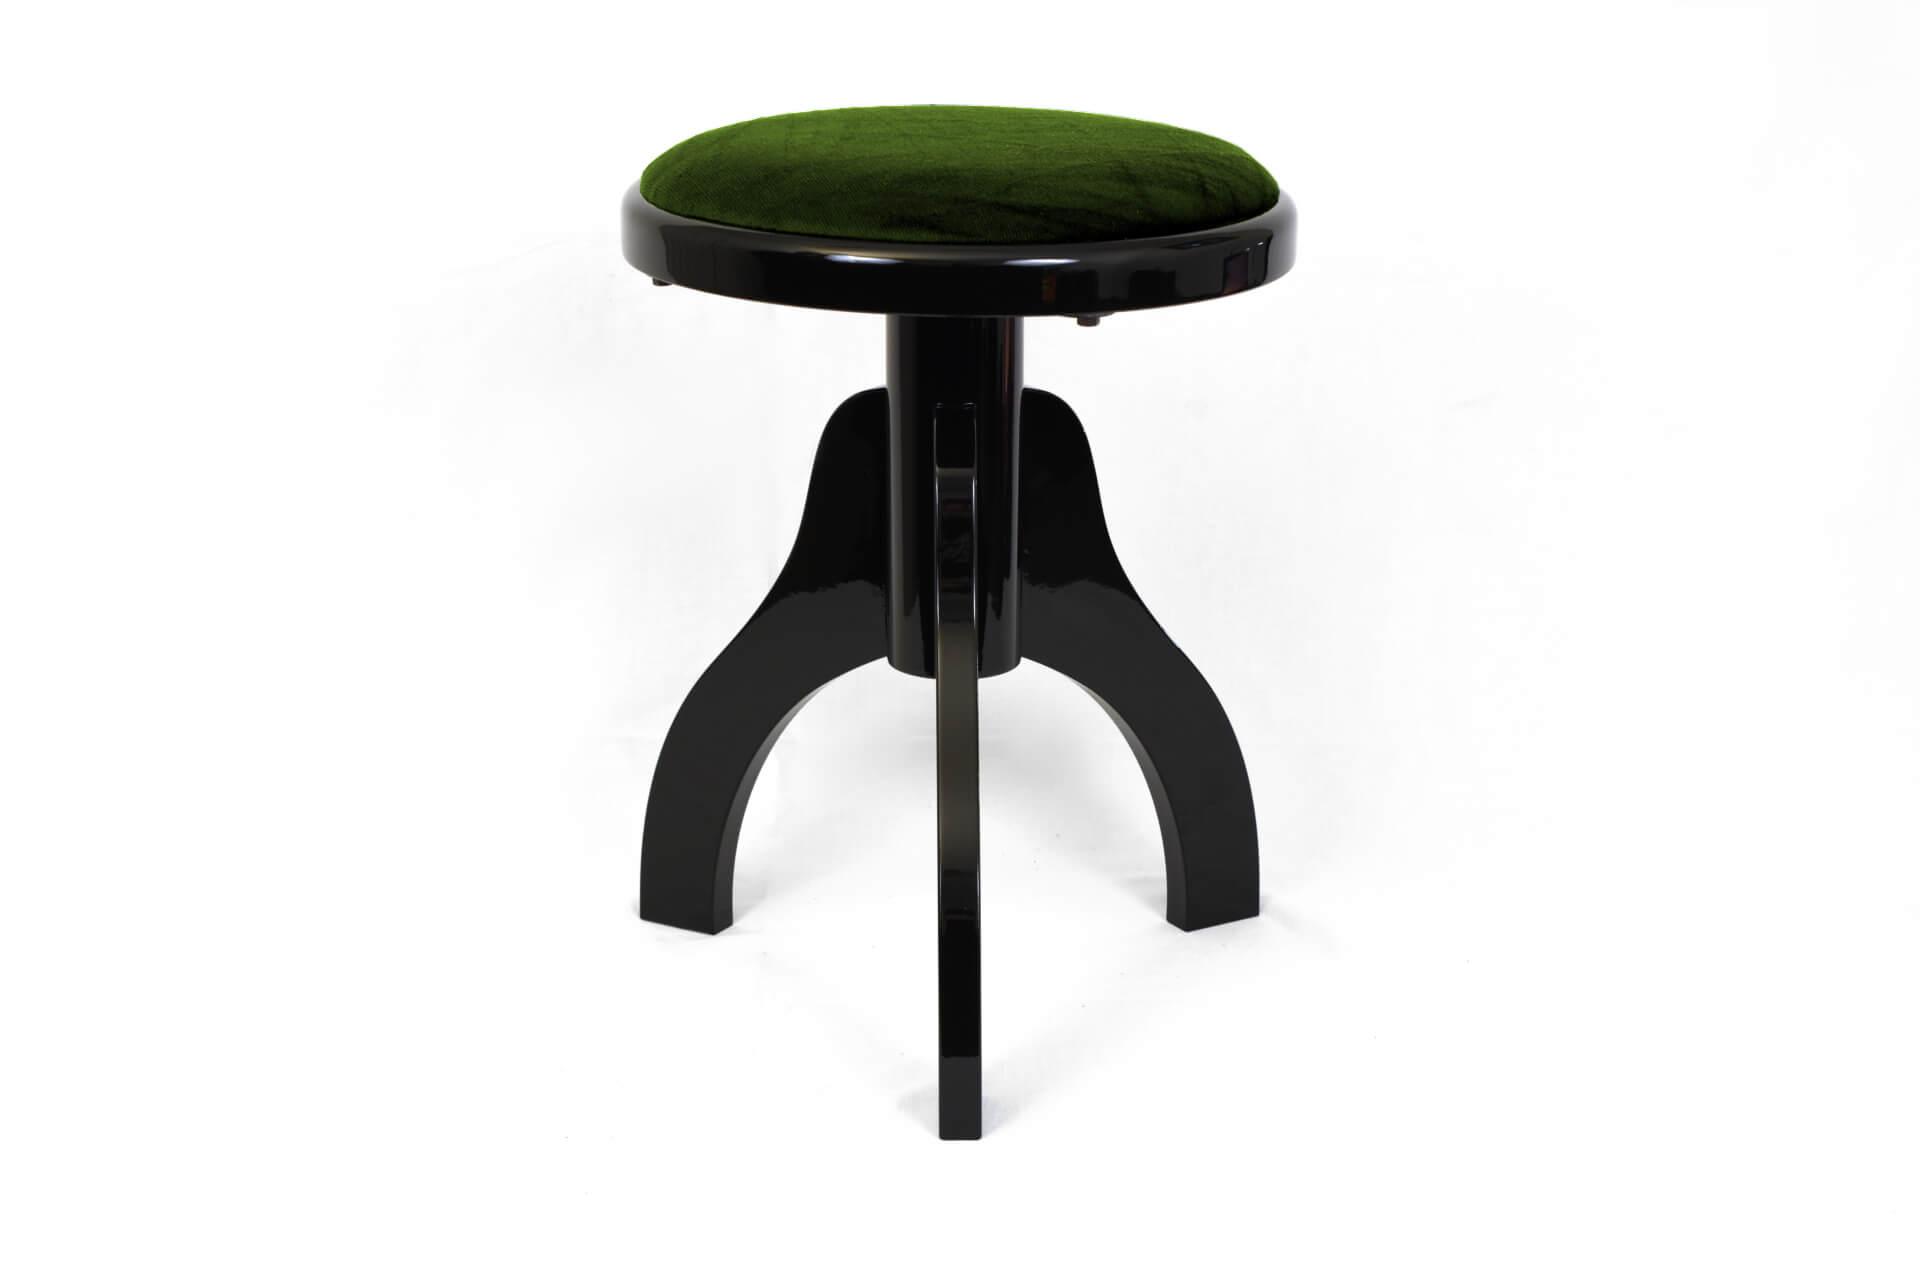 Sgabello per arpa a tre gambe u201ctartiniu201d velluto verde colore legno